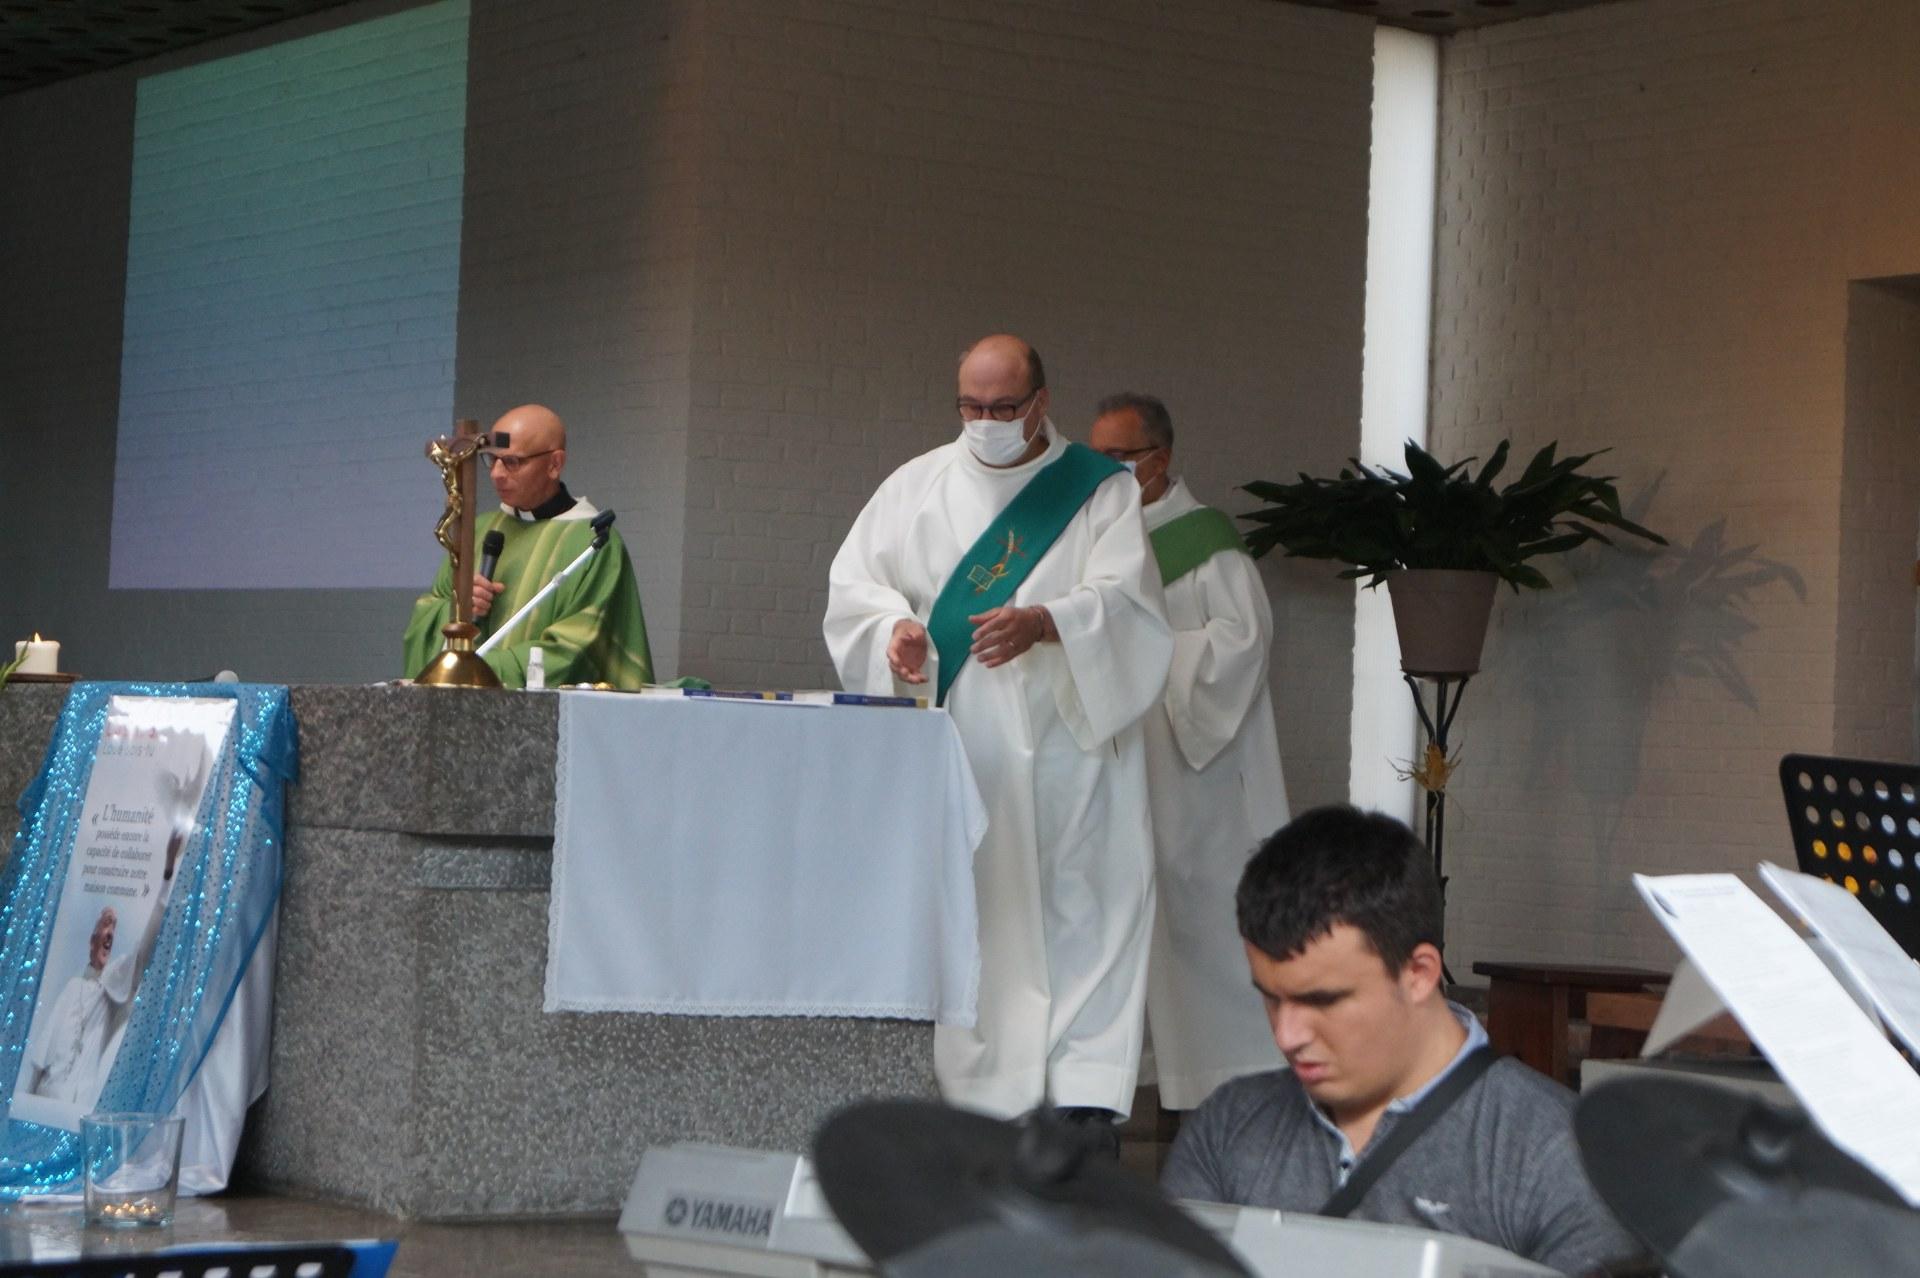 entree en catechumenat 6 sept 2020 (36)